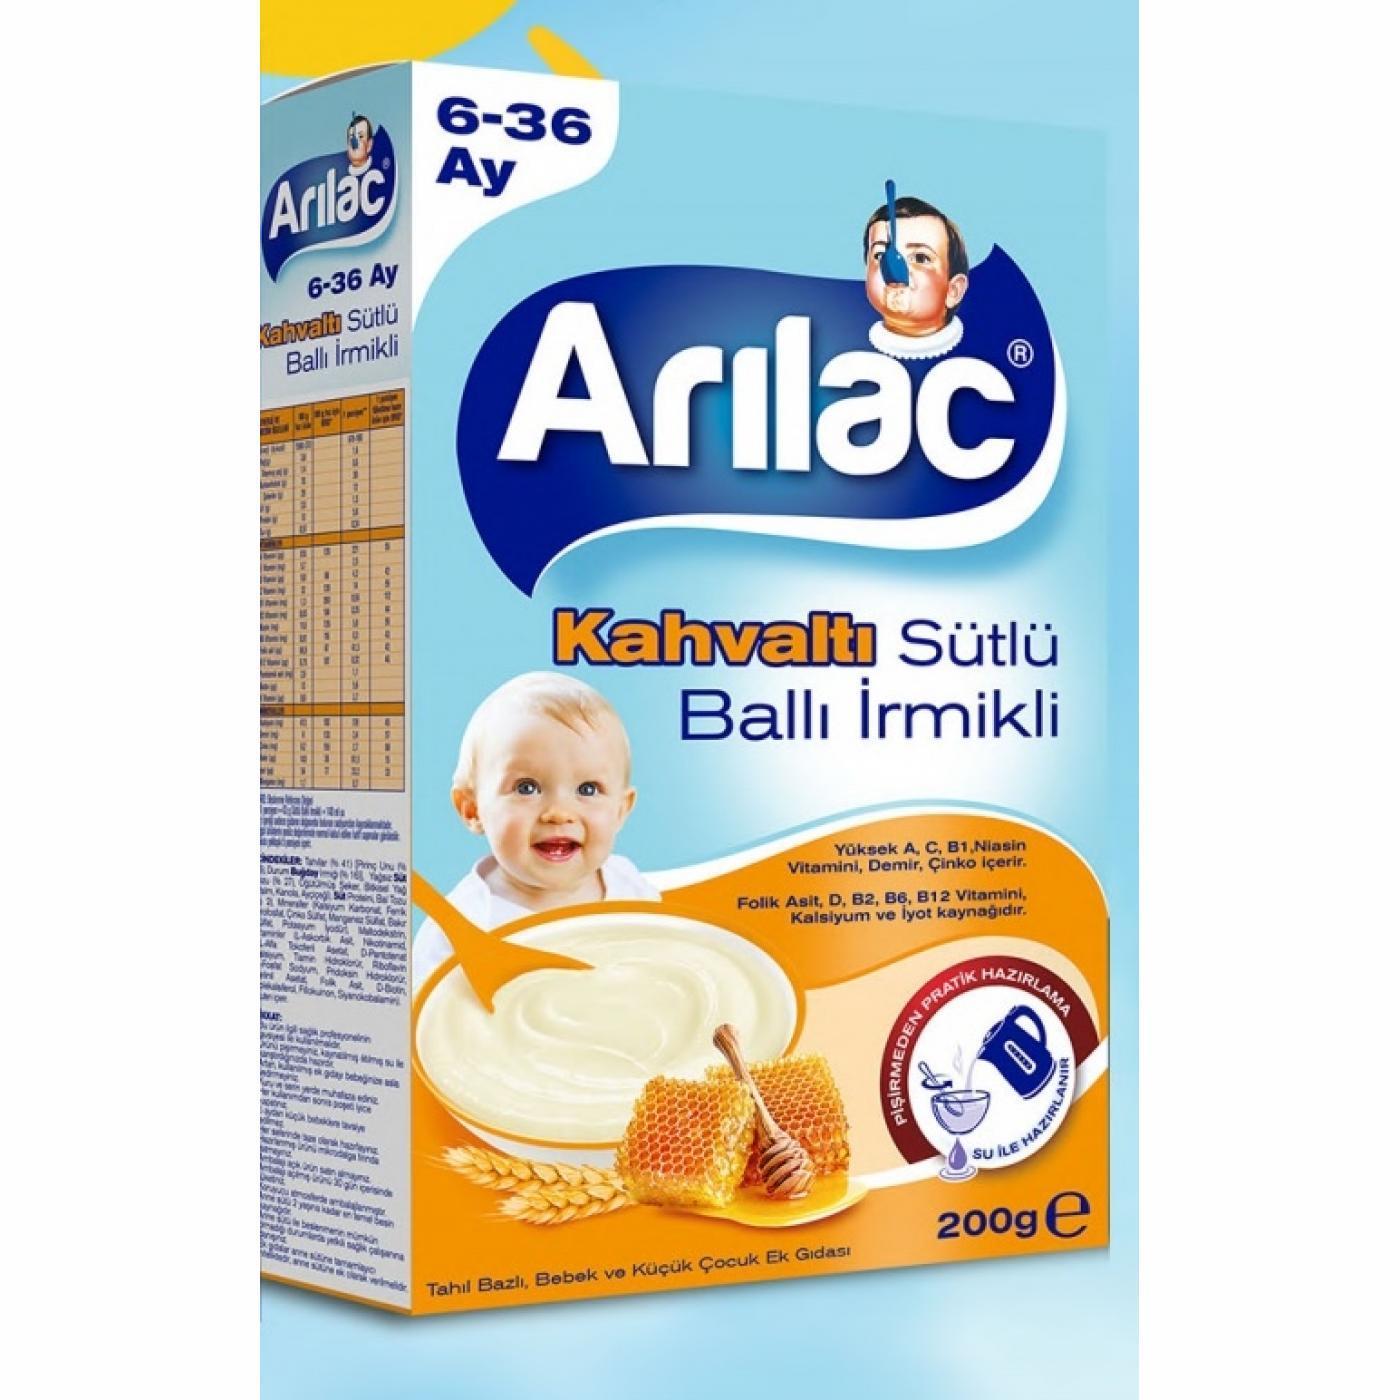 ARILAC 200GR SÜTLÜ BALLI İRMİKLİ